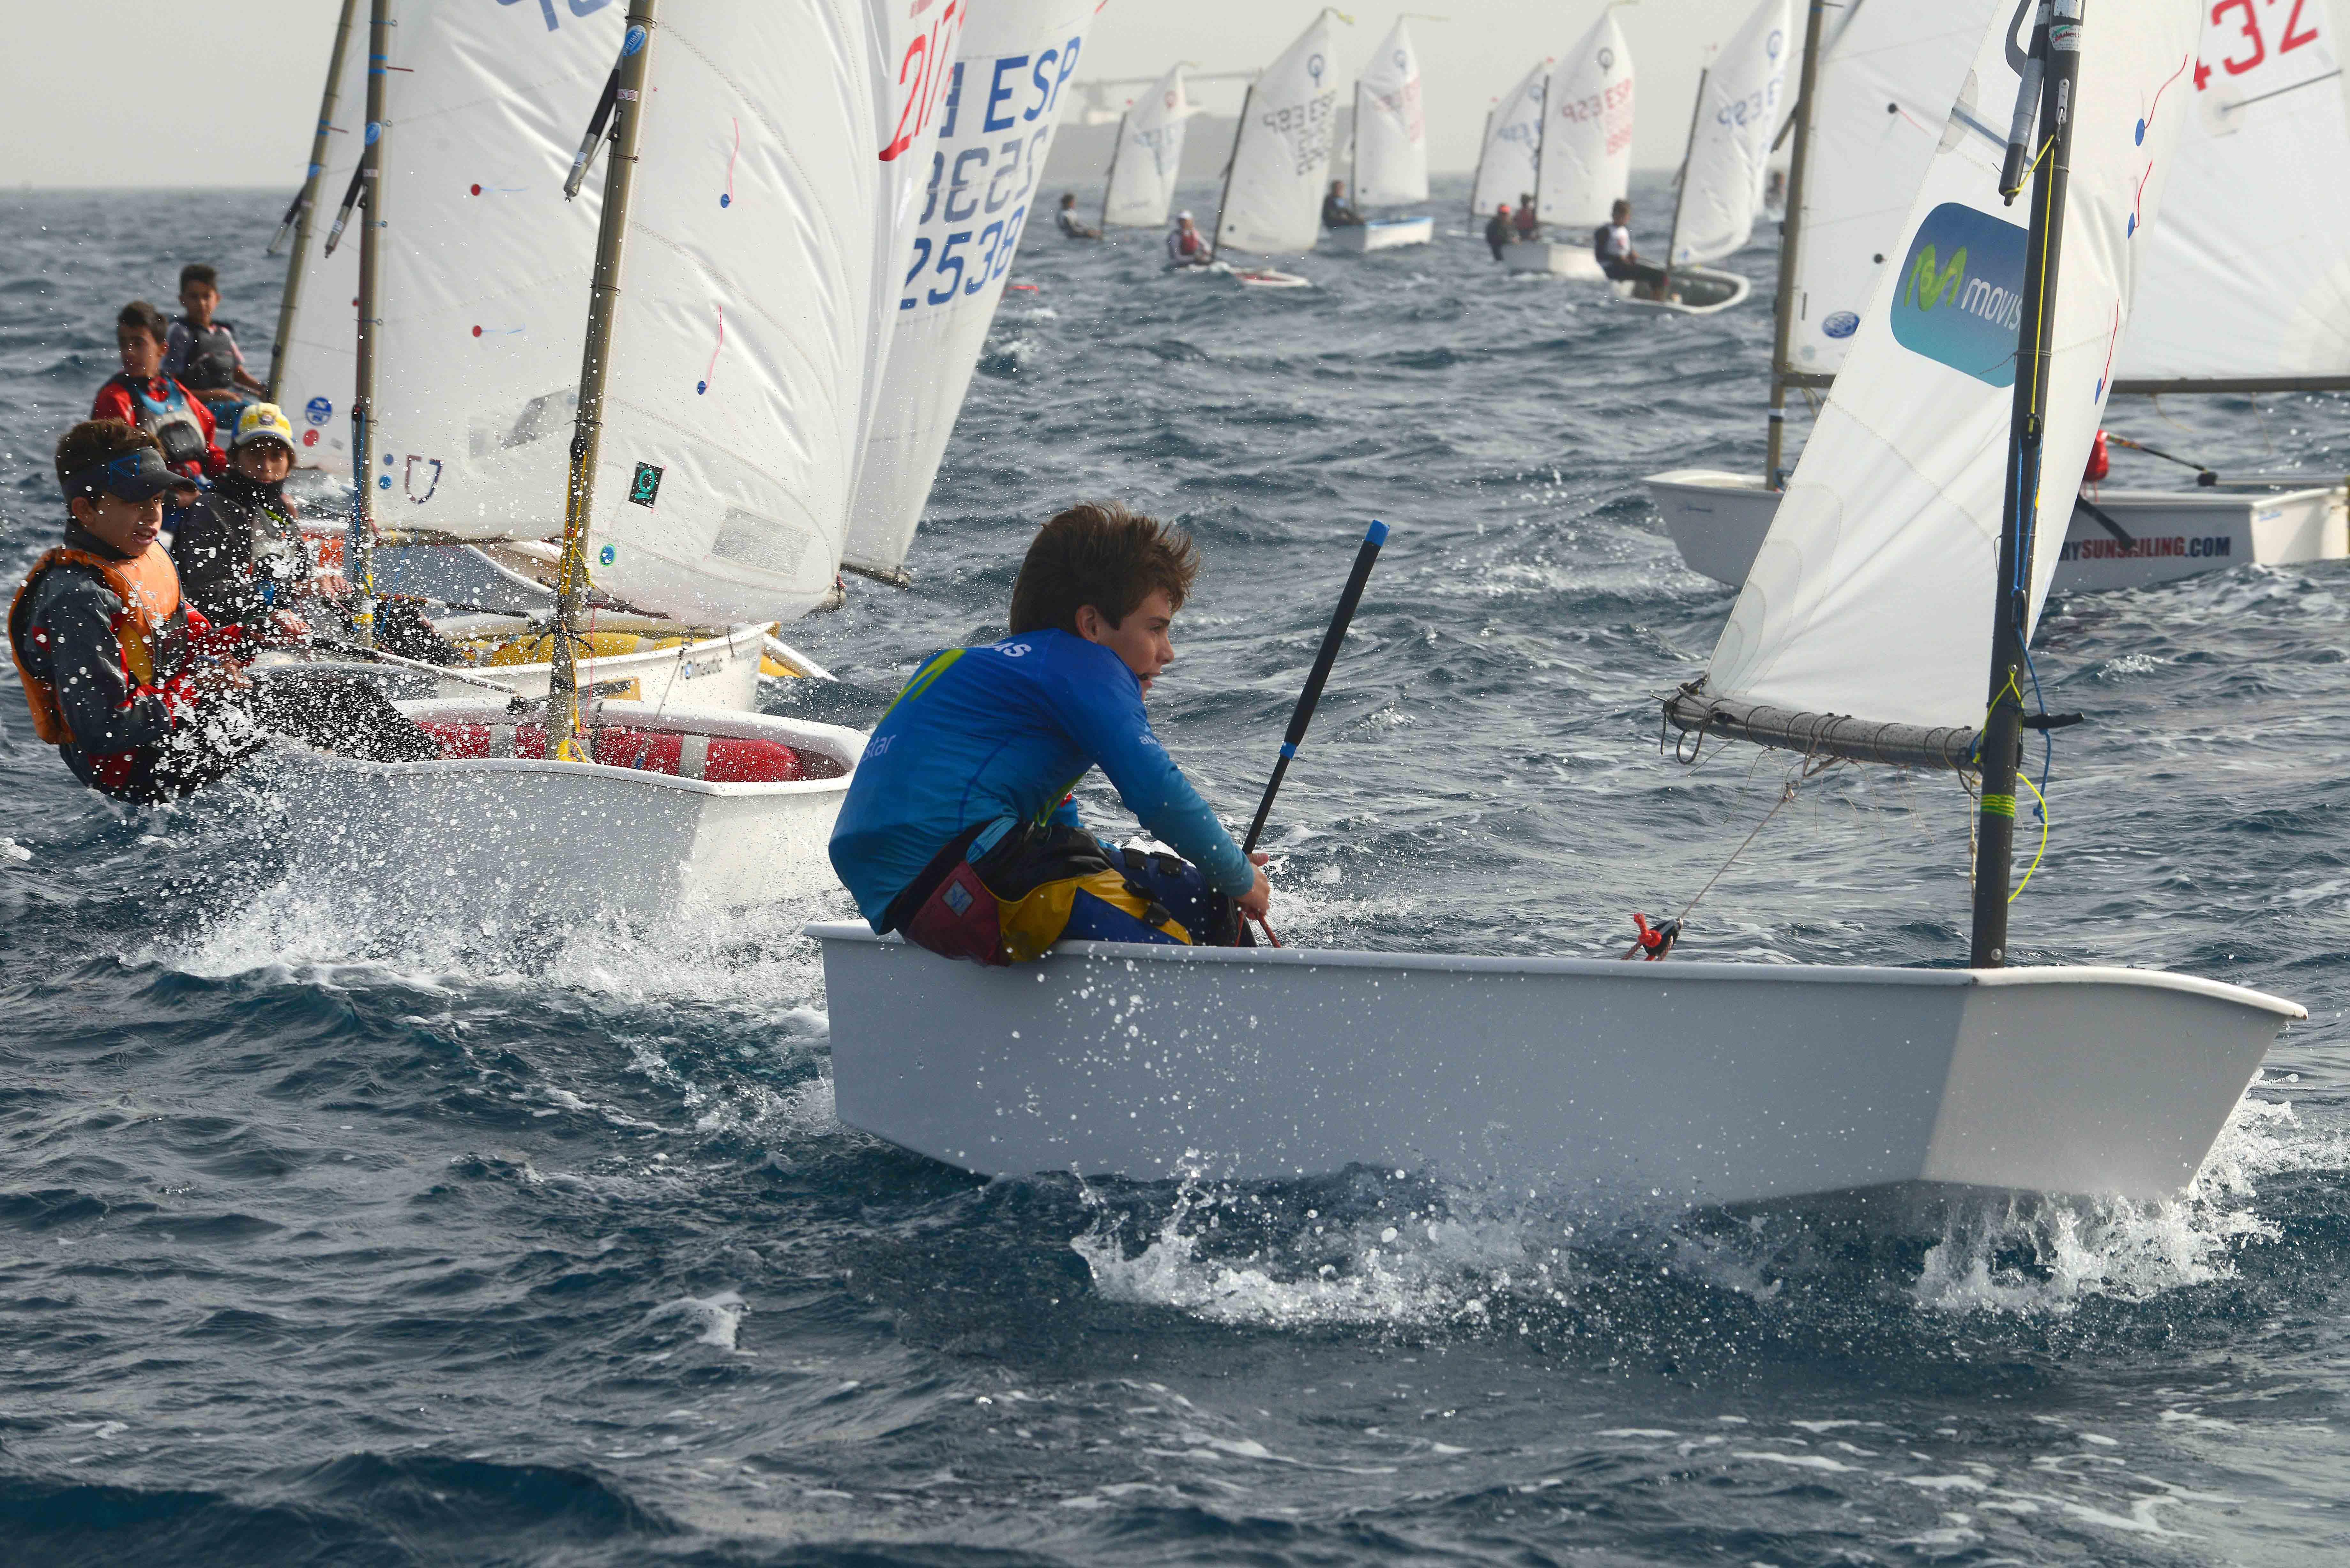 Gran actuación de Nacho Dávila en aguas de Gran Canaria